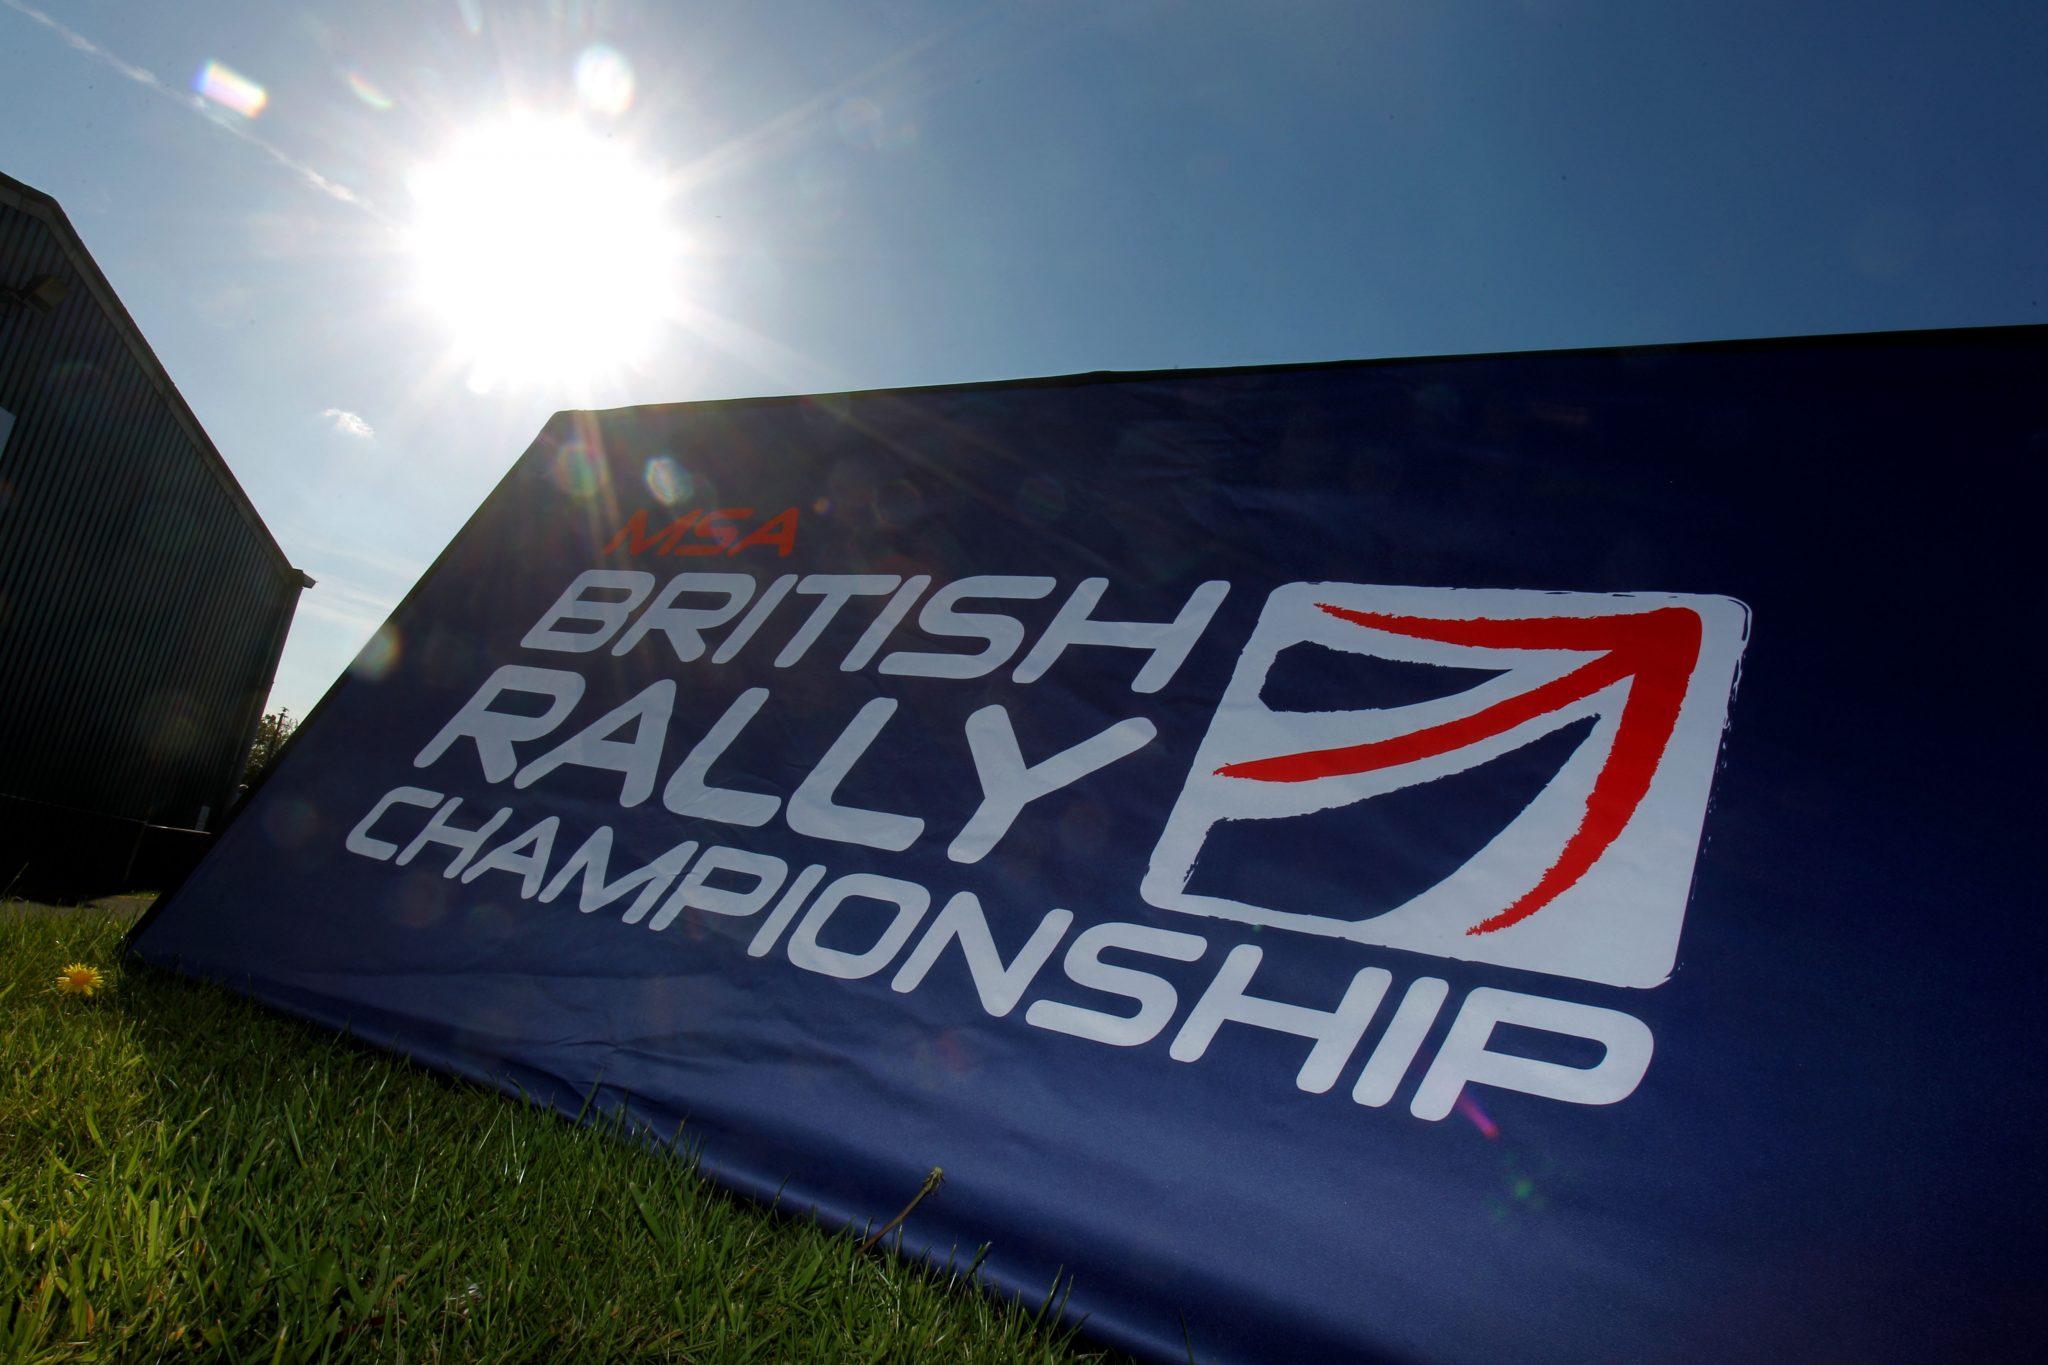 3000, 3000, British Rally Championship, BRC-09.jpg, 252732, https://surfturf.co.uk/wp-content/uploads/2018/06/BRC-09.jpg, https://surfturf.co.uk/case-studies/british-rally/attachment/british-rally-championship-9/, , 3, , British Rally Championship, british-rally-championship-9, inherit, 849, 2018-11-28 14:22:33, 2018-11-28 14:22:33, 0, image/jpeg, image, jpeg, https://surfturf.co.uk/wp-includes/images/media/default.png, 2048, 1365, Array